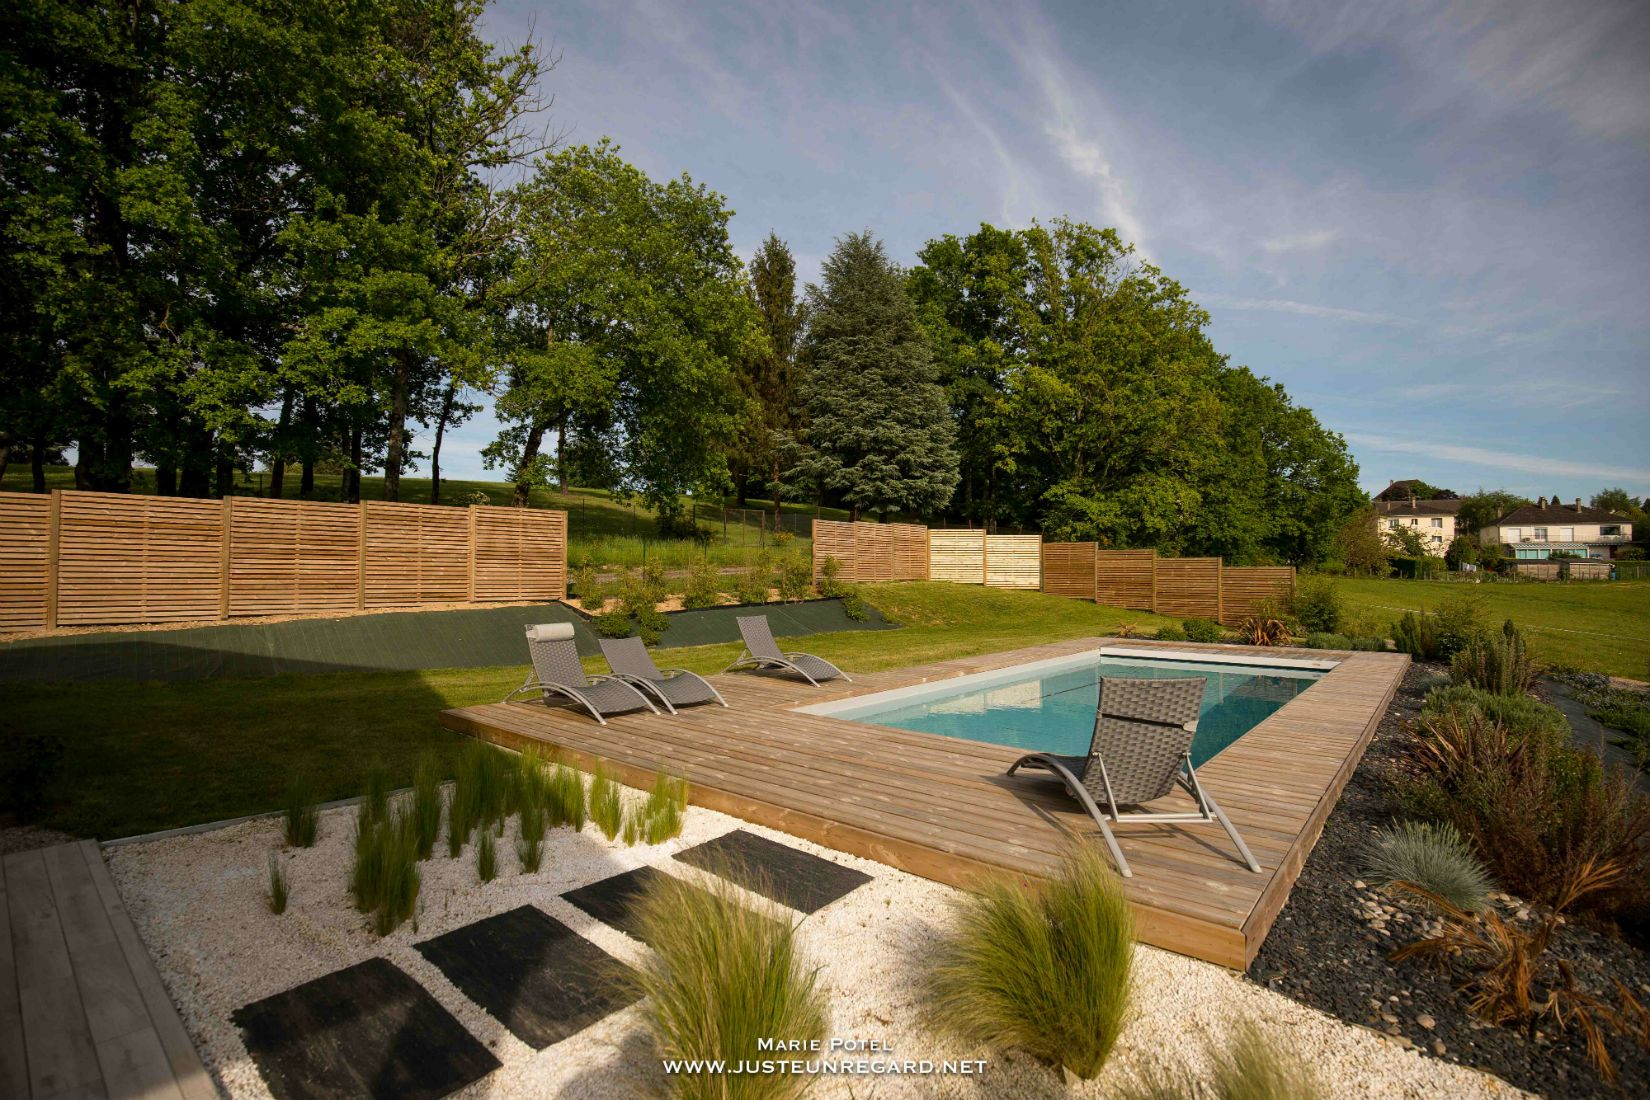 Rebeyrol créateur de Jardins Limoges, Aménagement de jardins Limoges ...